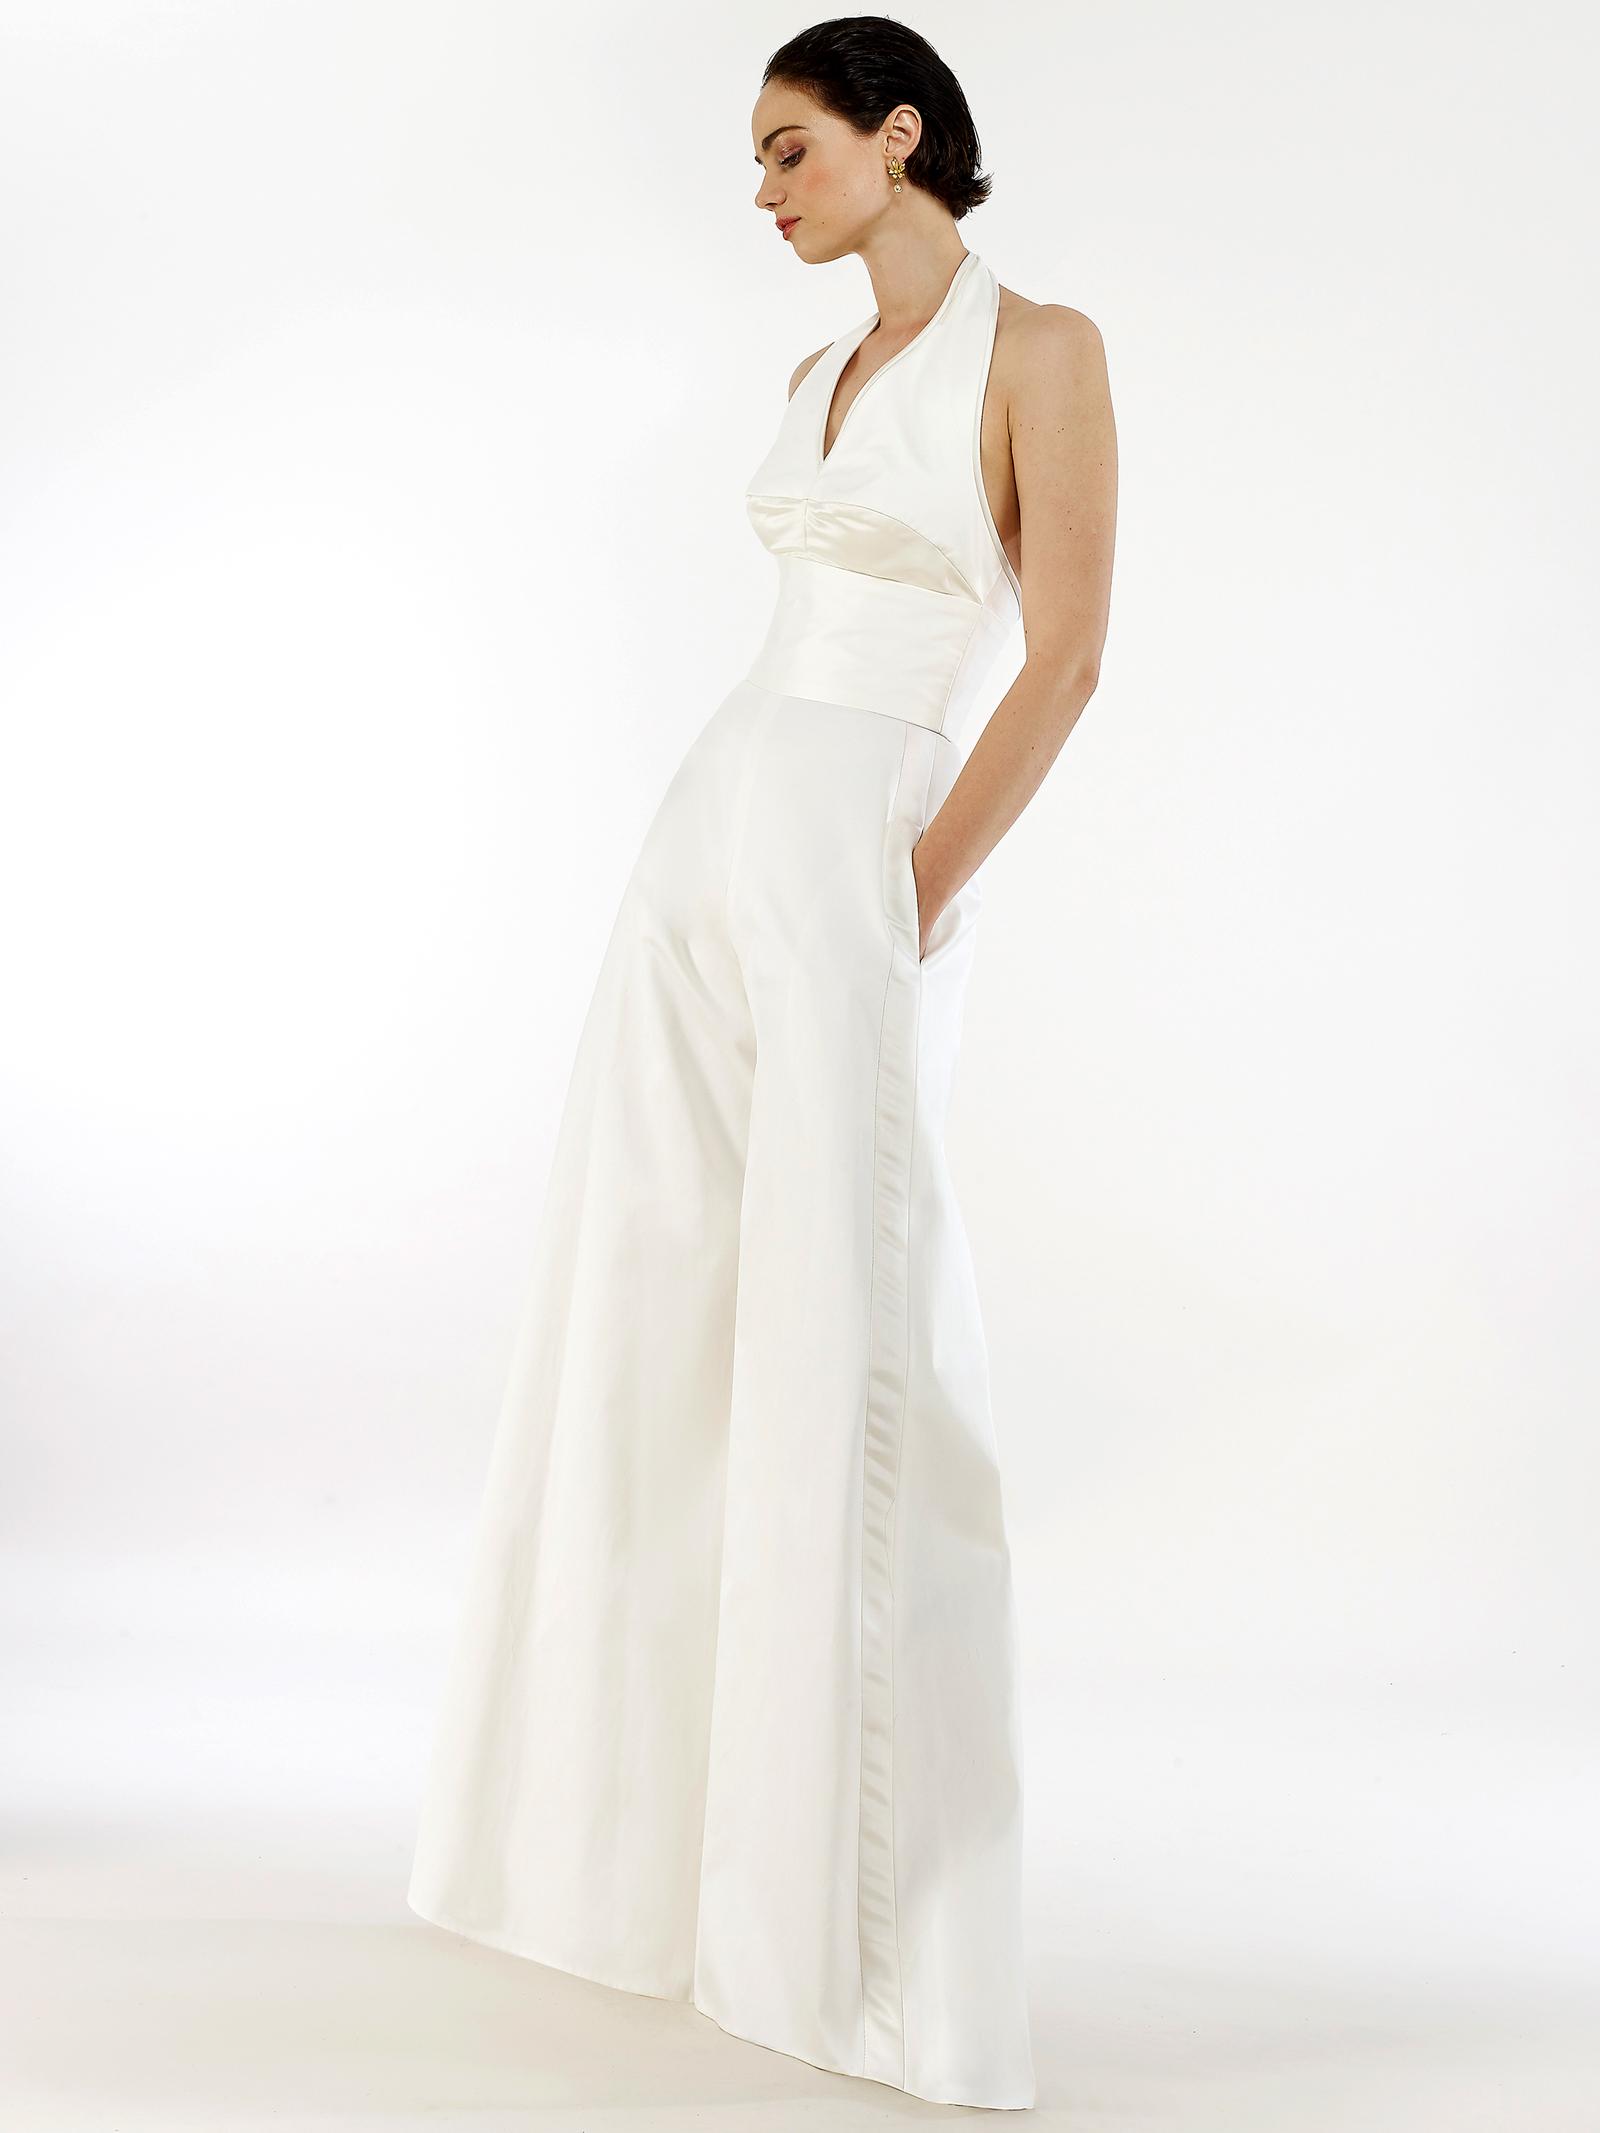 Steven Birnbaum halter top v-neck pockets jumpsuit wedding dress fall 2020